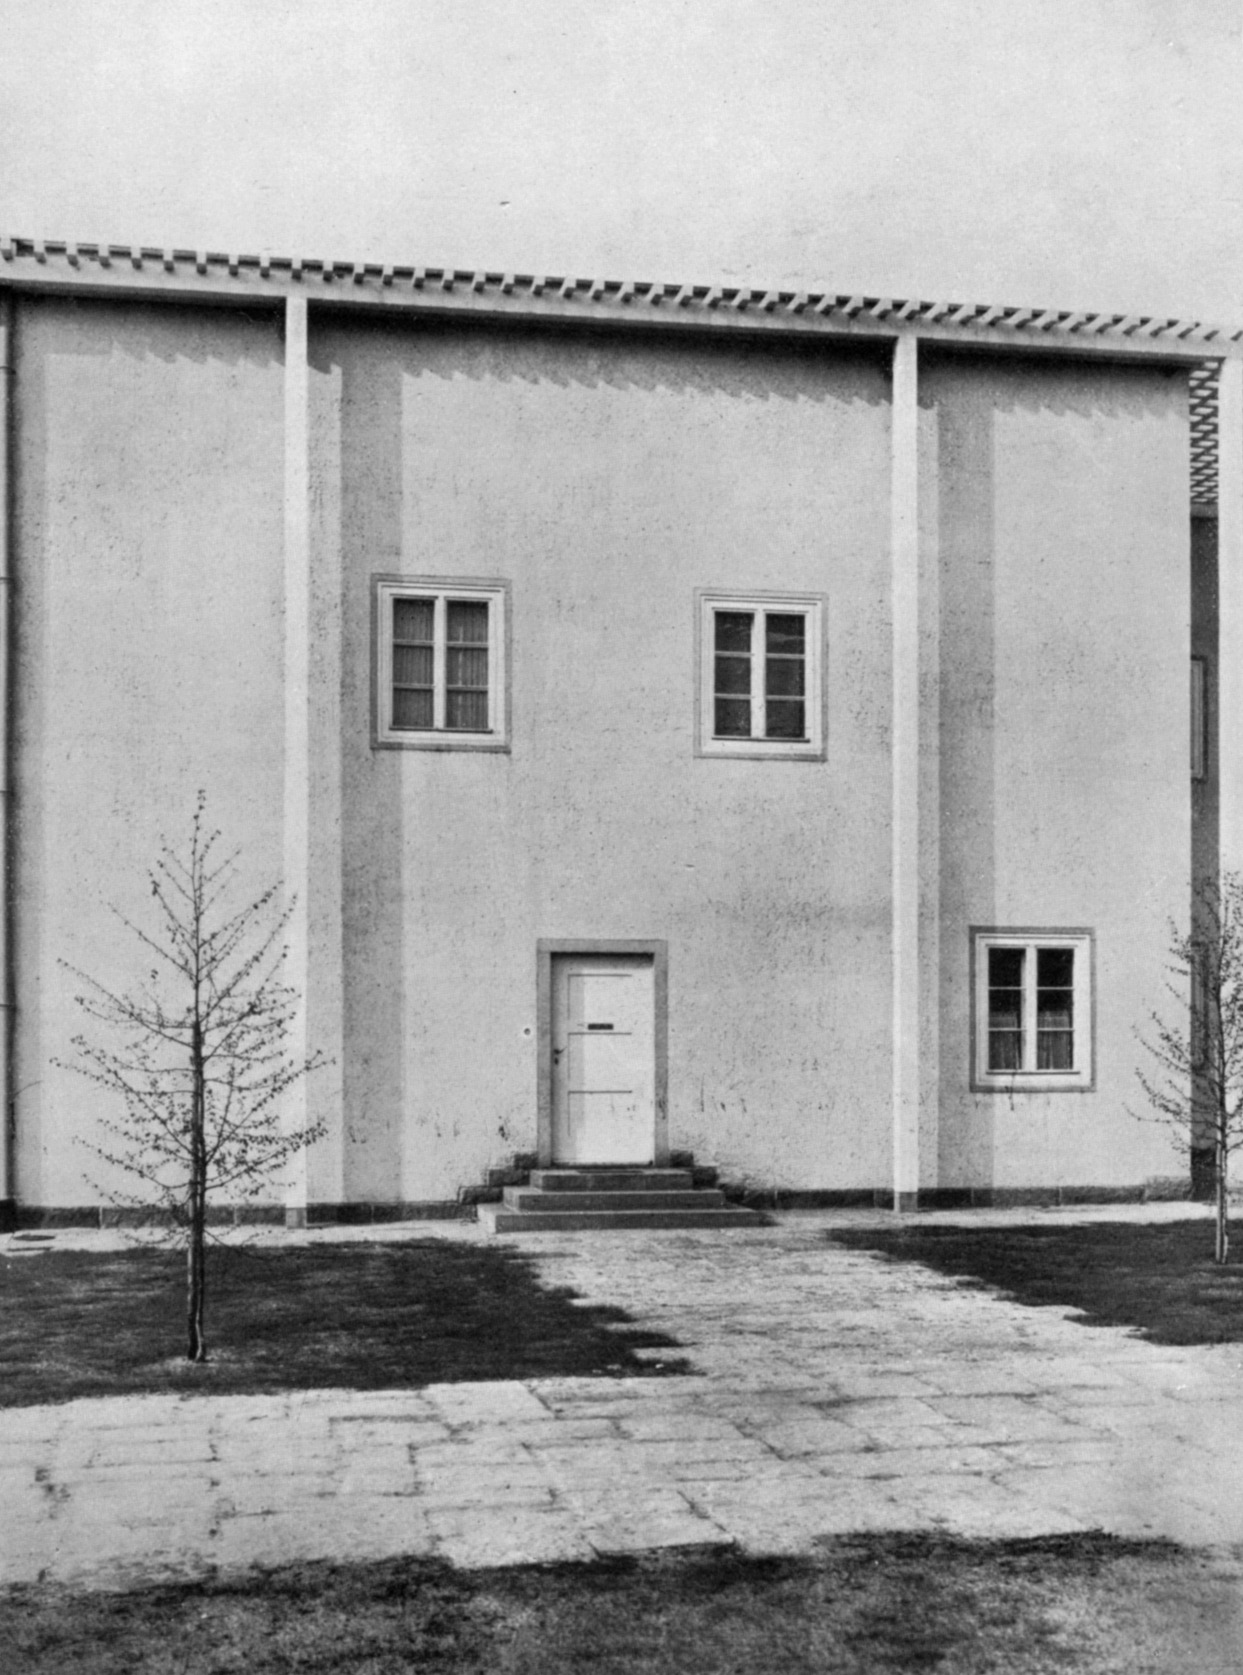 Le Jardin Des Provinces Pessac Charmant Neueregel Heinrich Tessenow Sächsische Landesschule Dresden